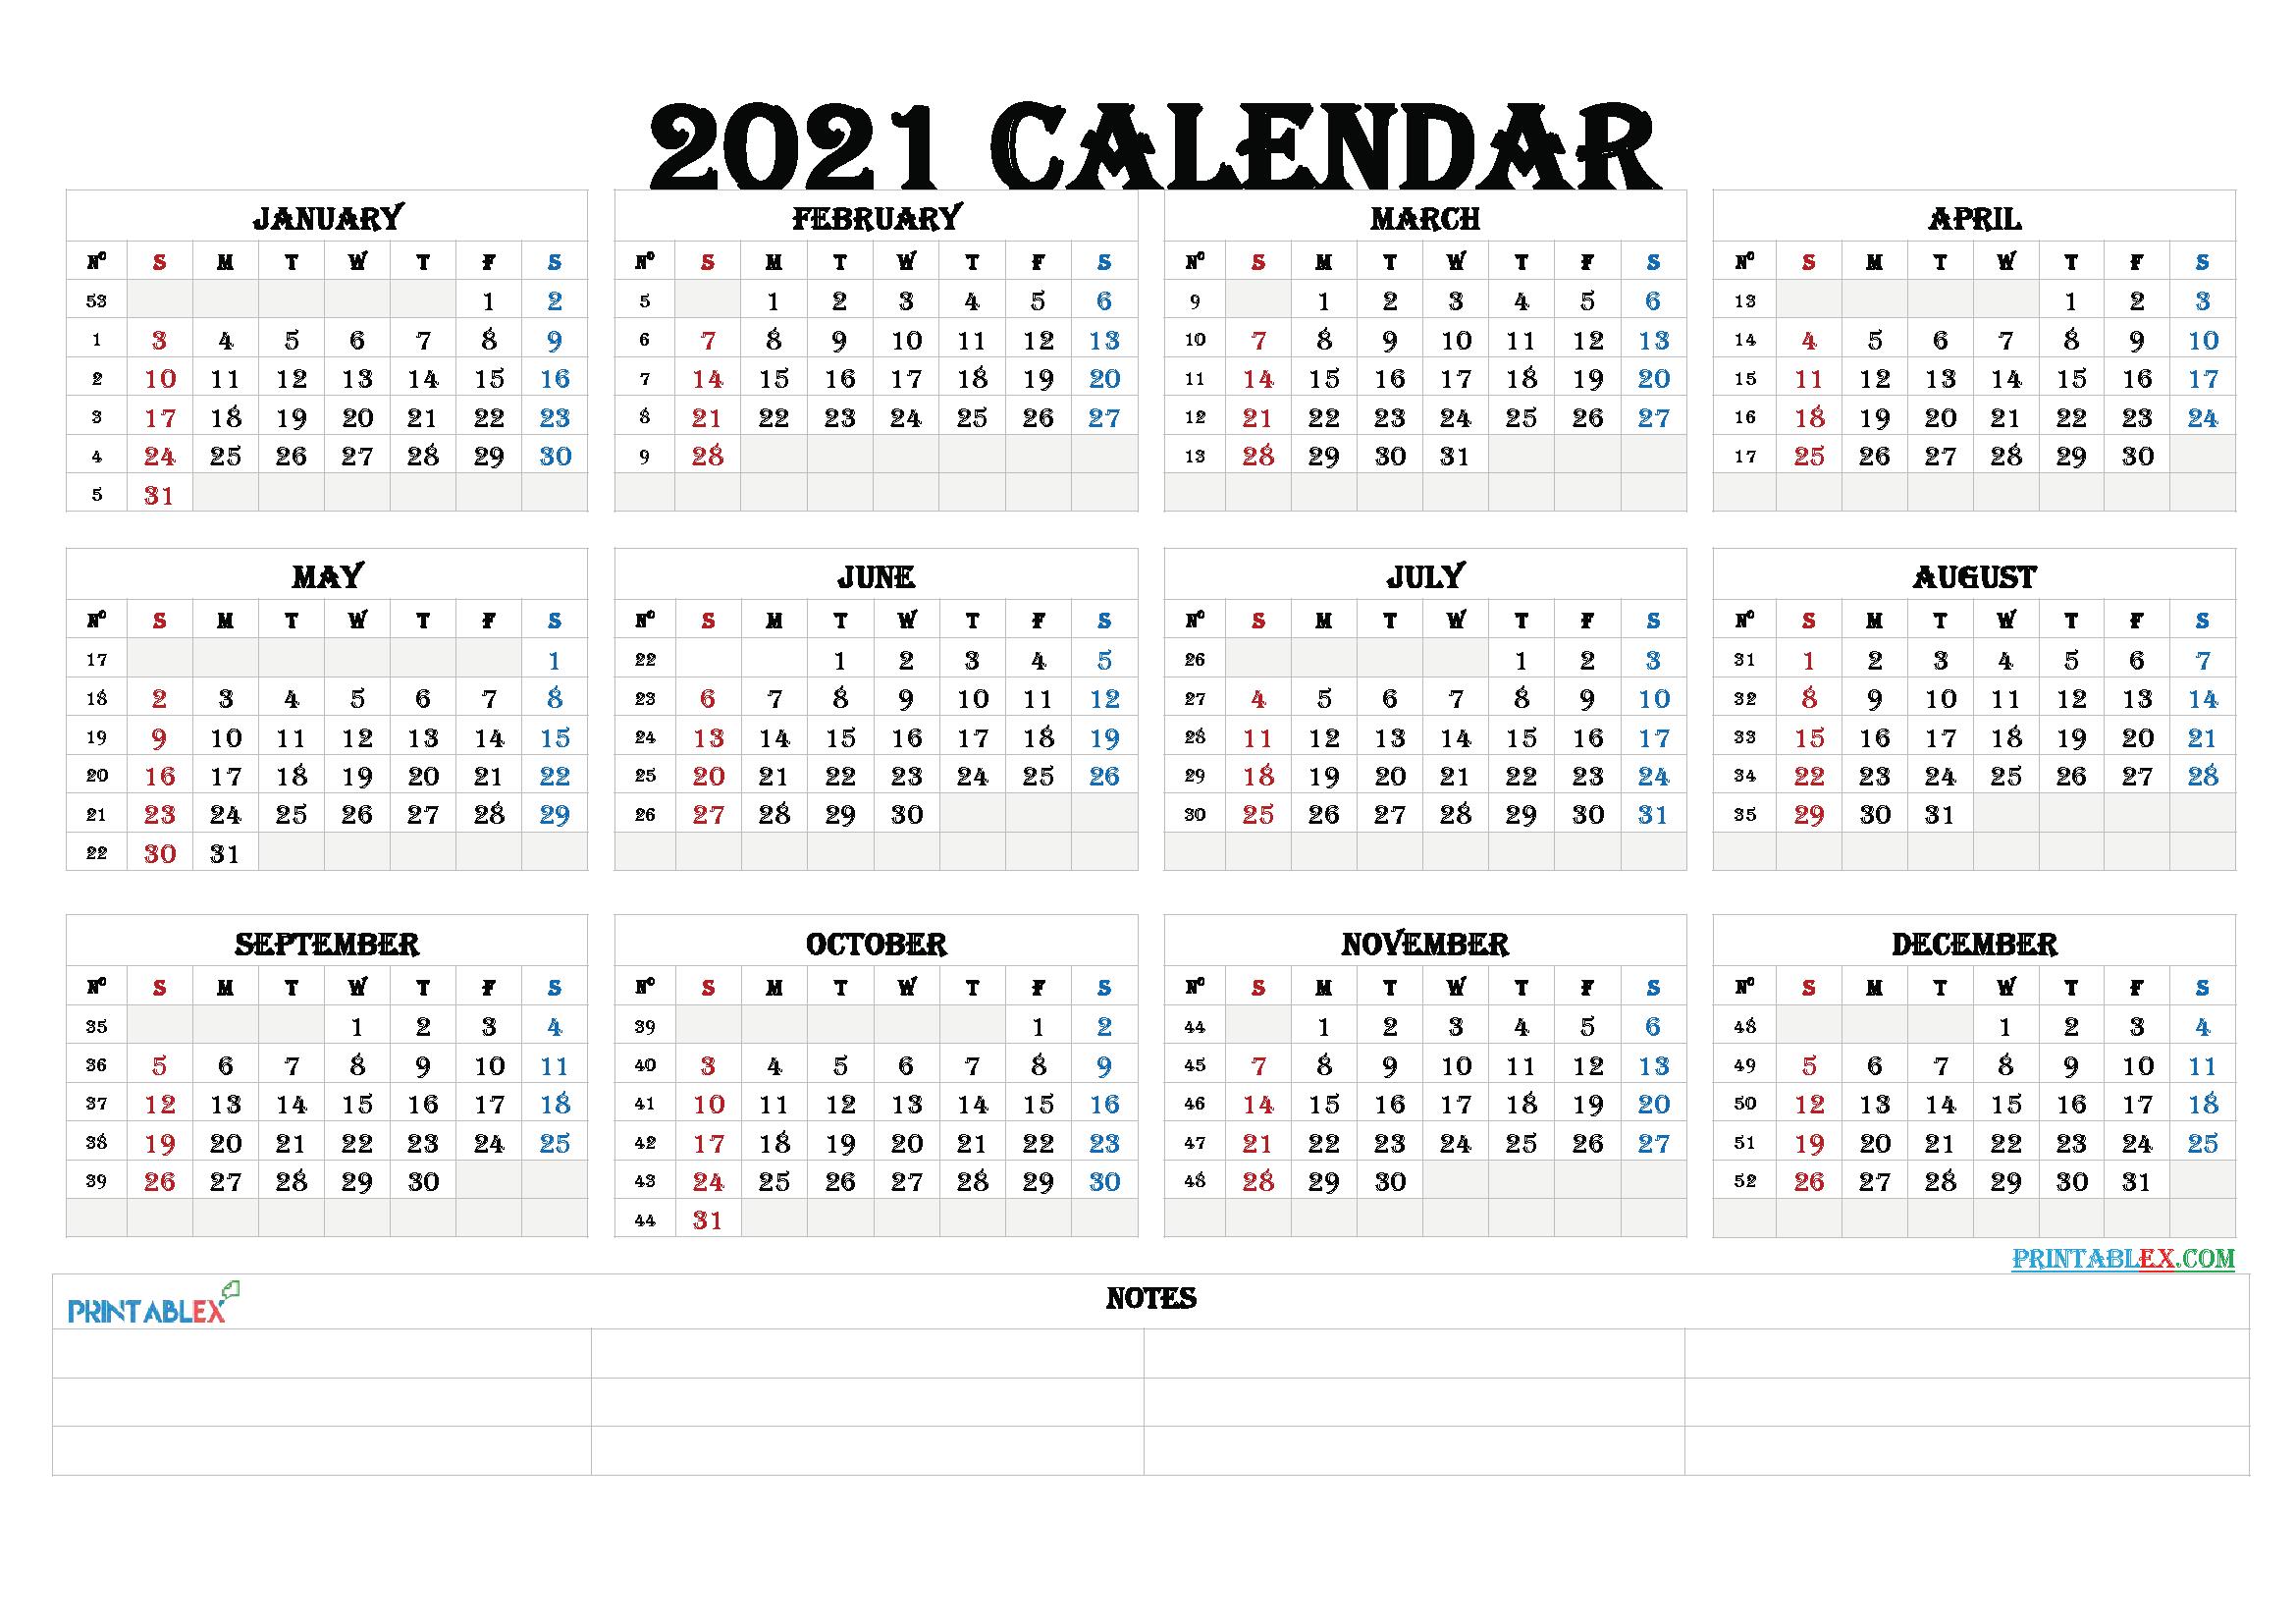 Free Editable Weekly 2021 Calendar : 2021 Editable